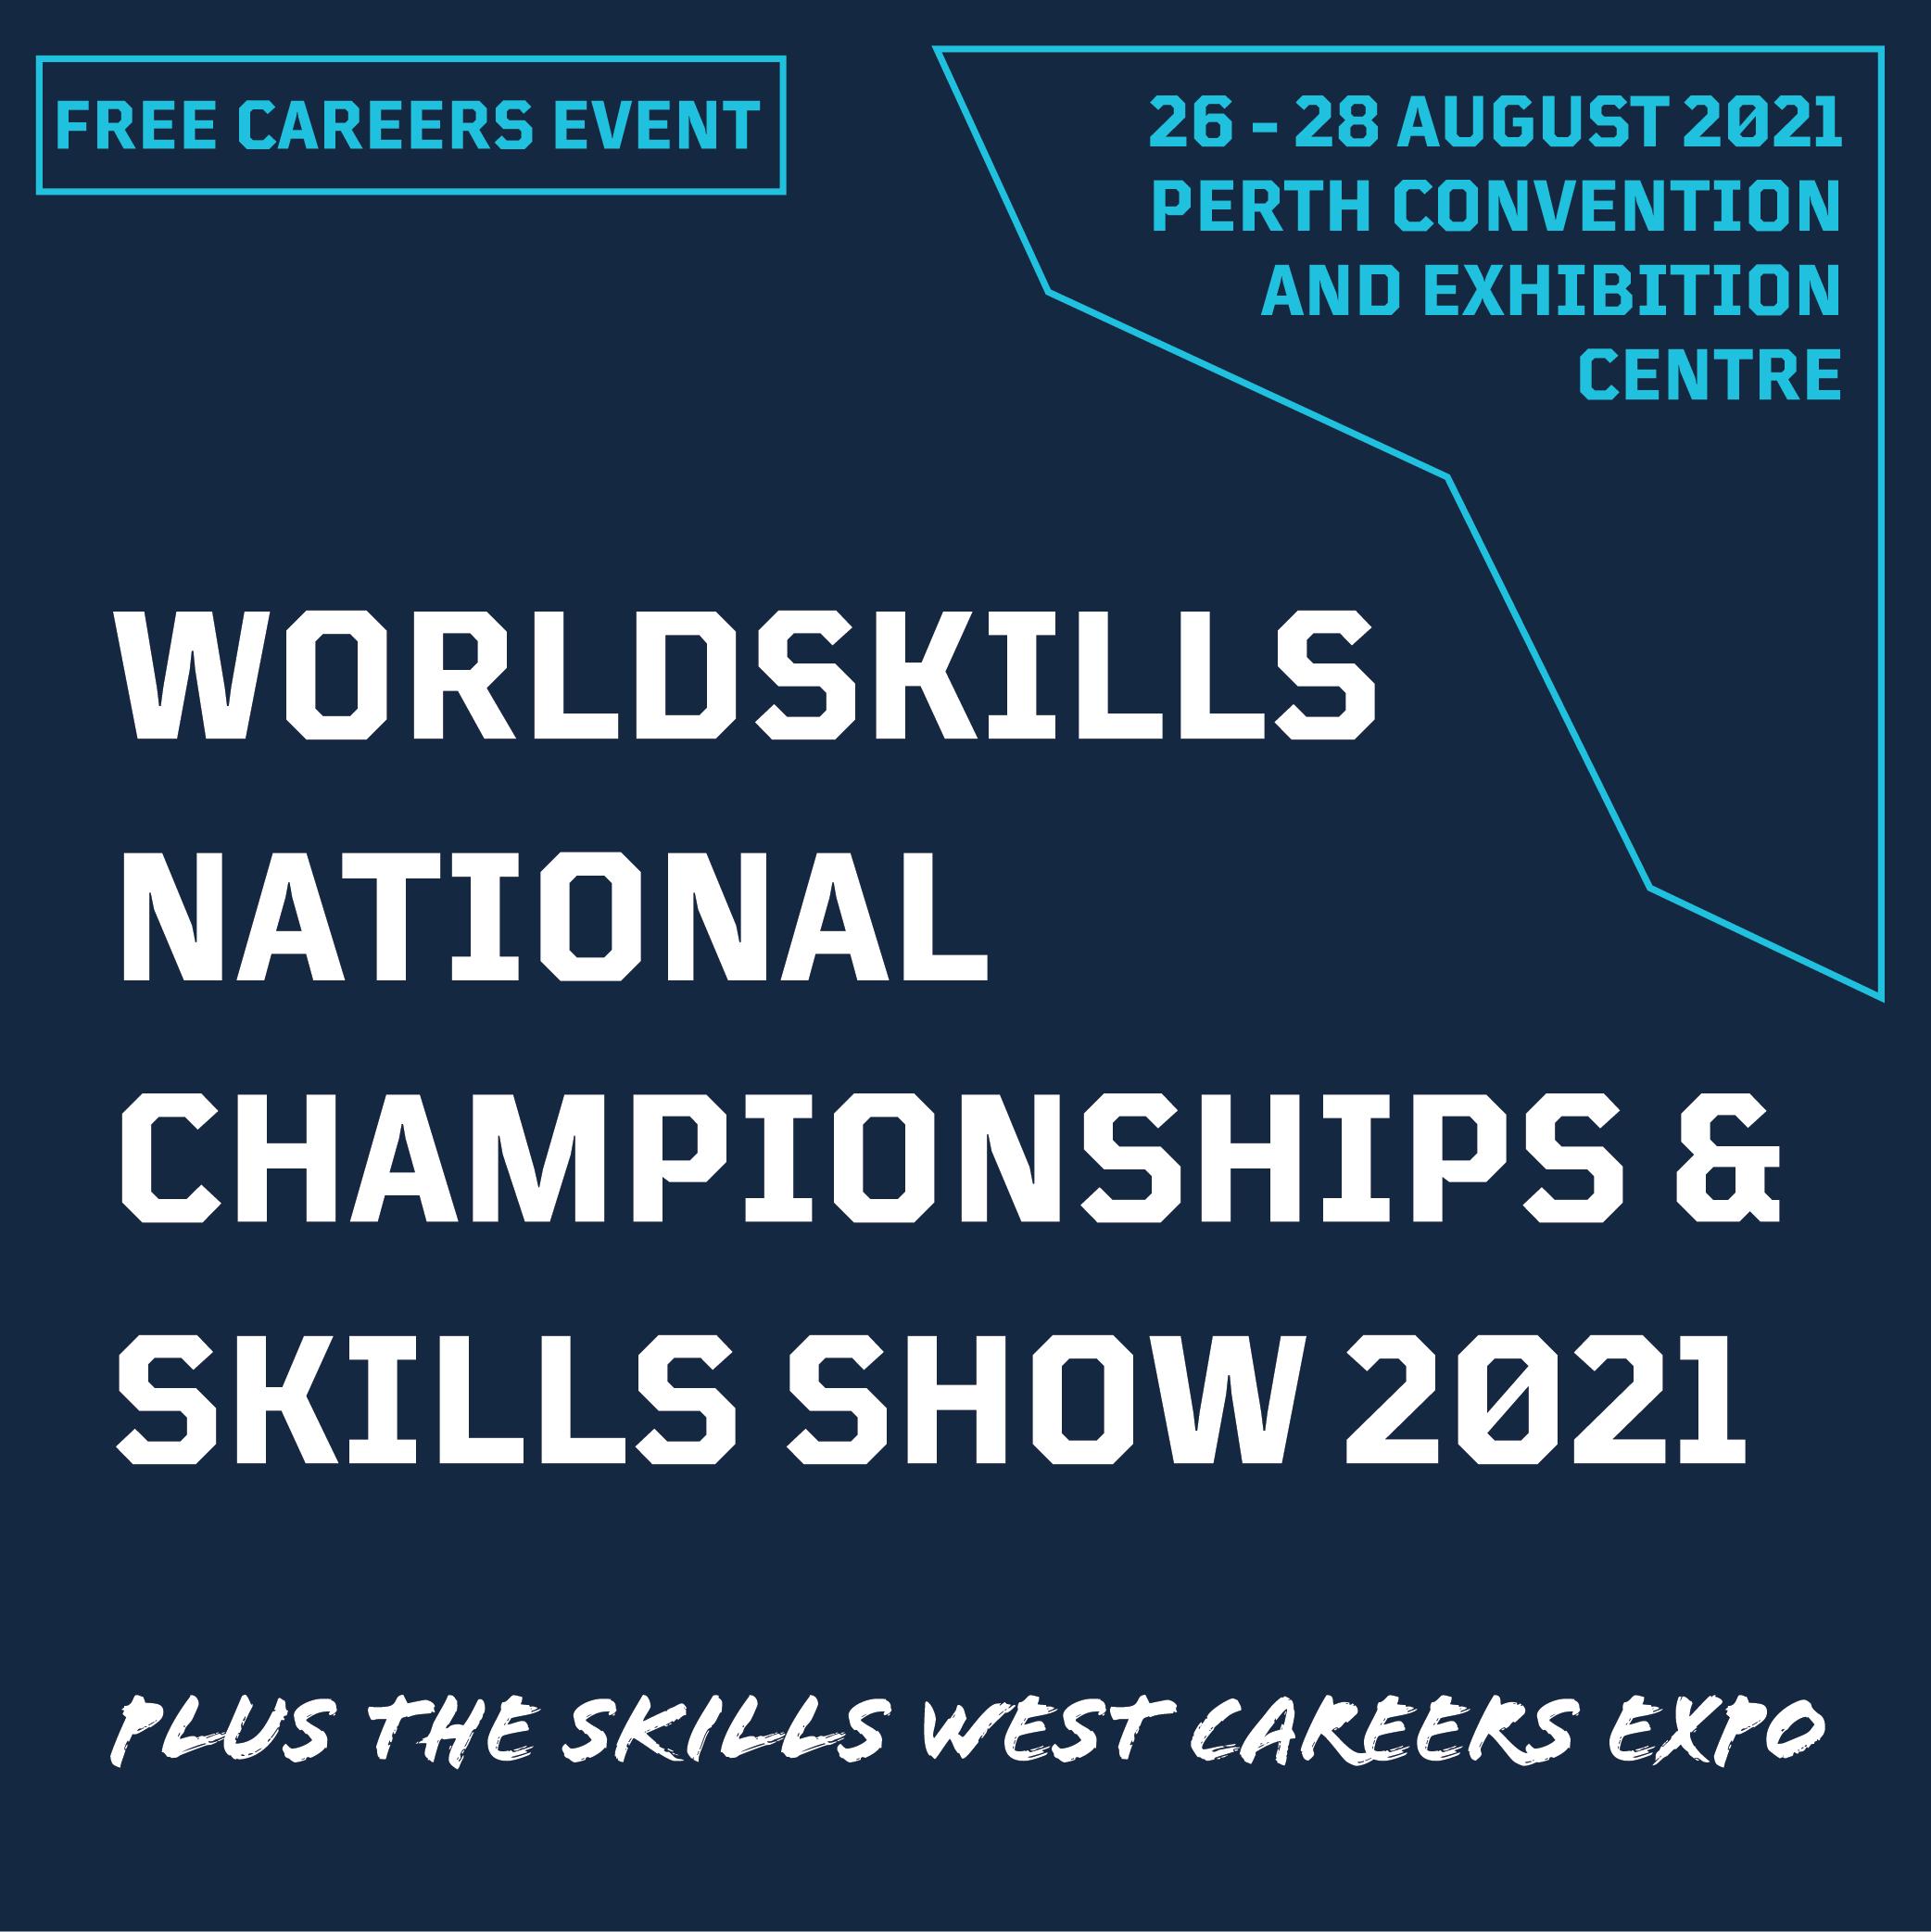 World skills national championships and skills show 2021 text